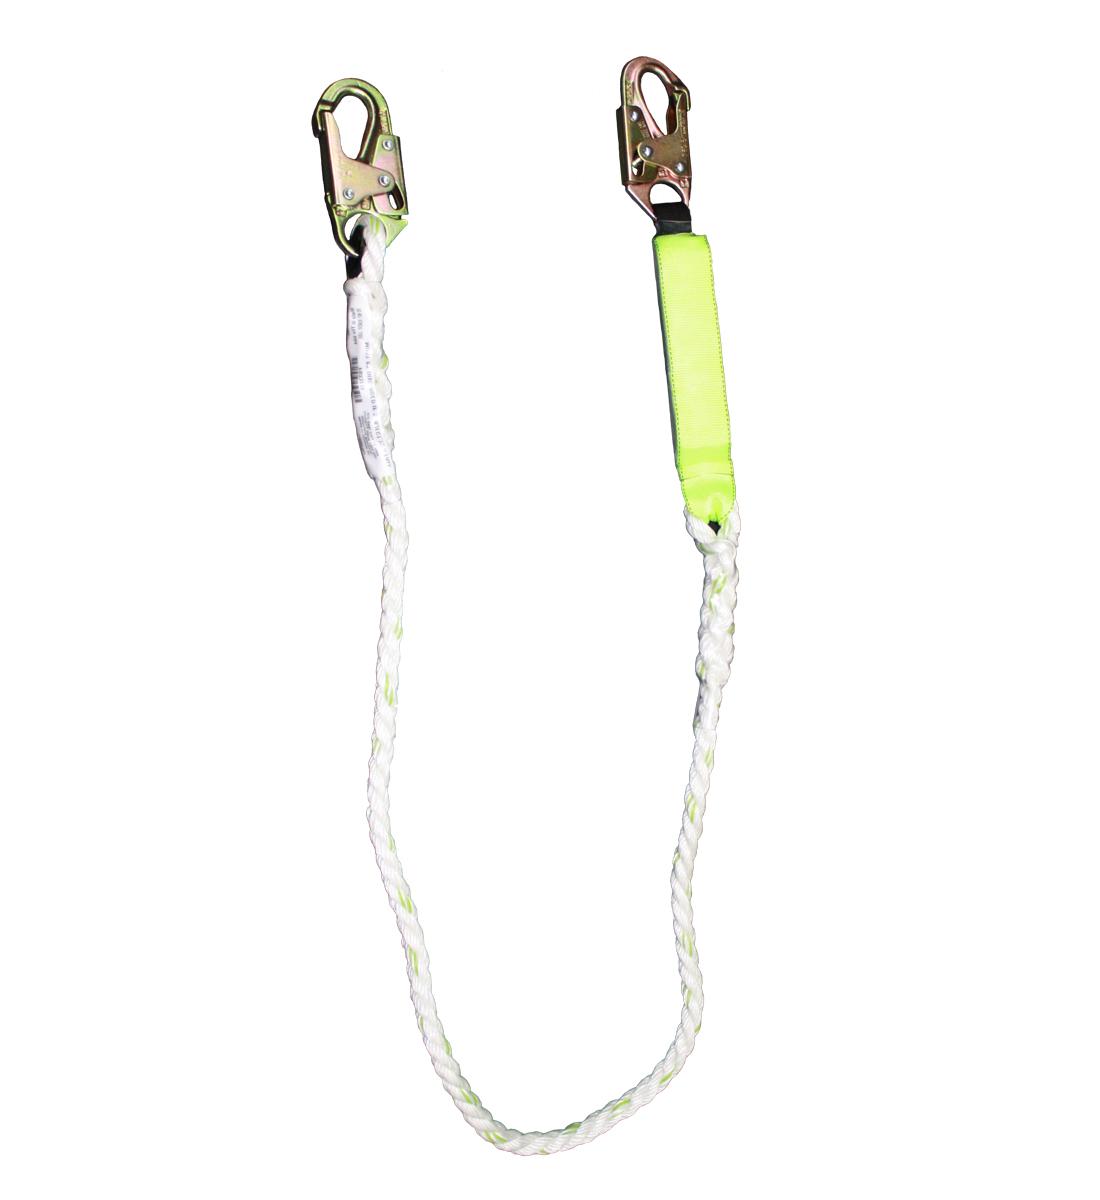 6 Energy Absorbing Rope Lanyard